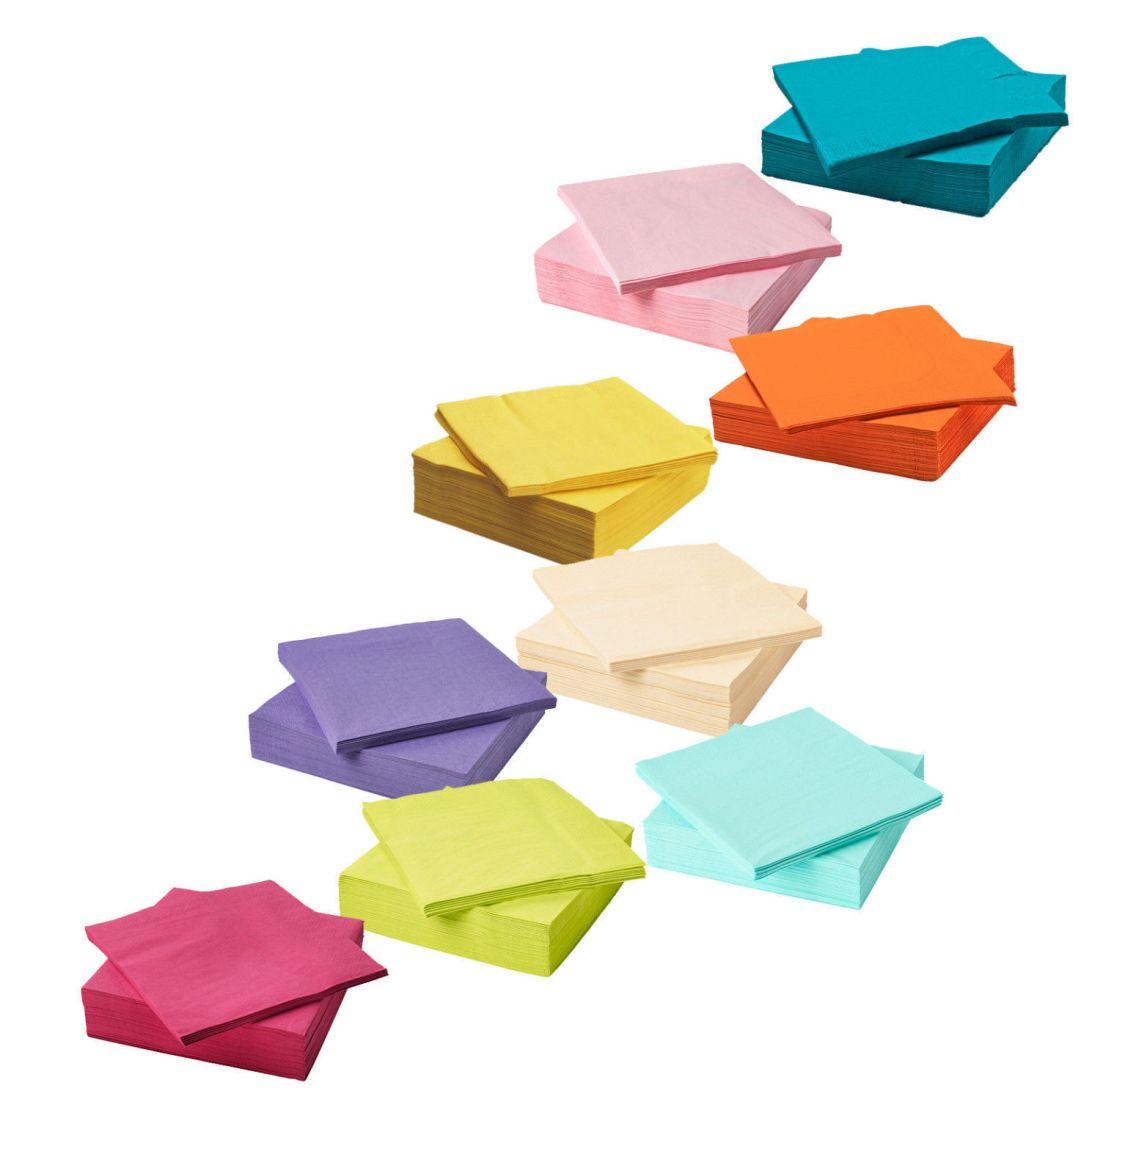 "IKEA Papierserviette ""FANTASTISK"" Servietten 40x40 cm je 50 Stück - div. Farben"